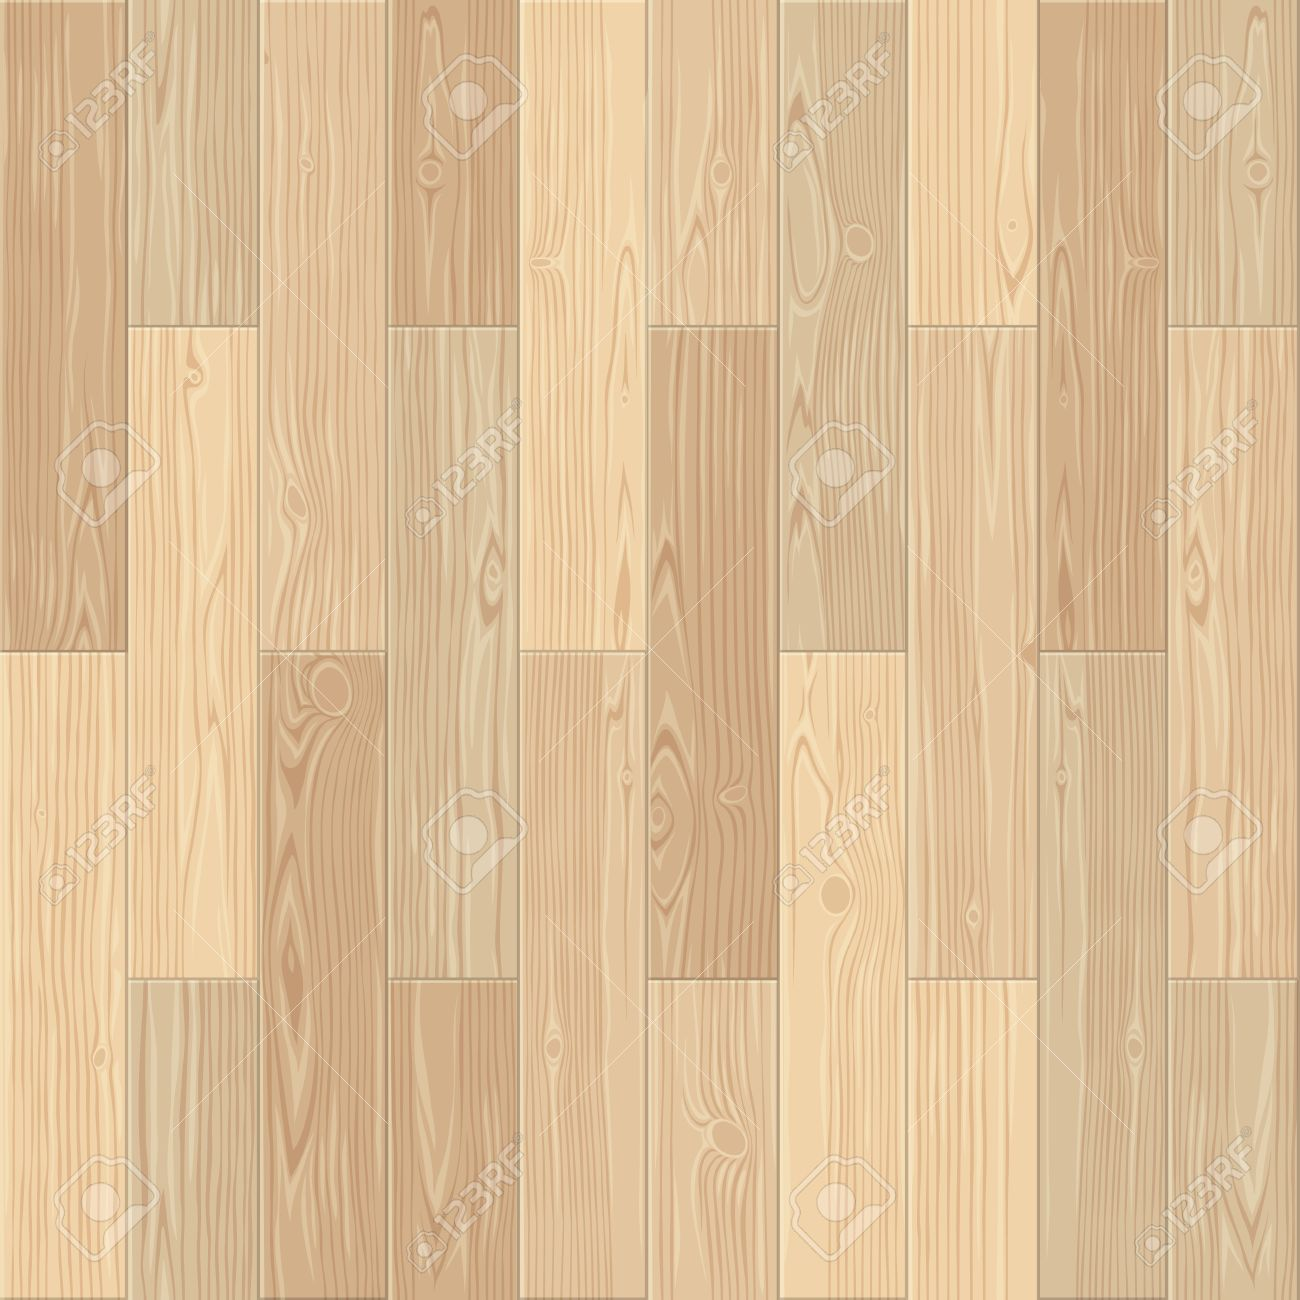 Light Parquet Seamless Floor Texture Stock Vector